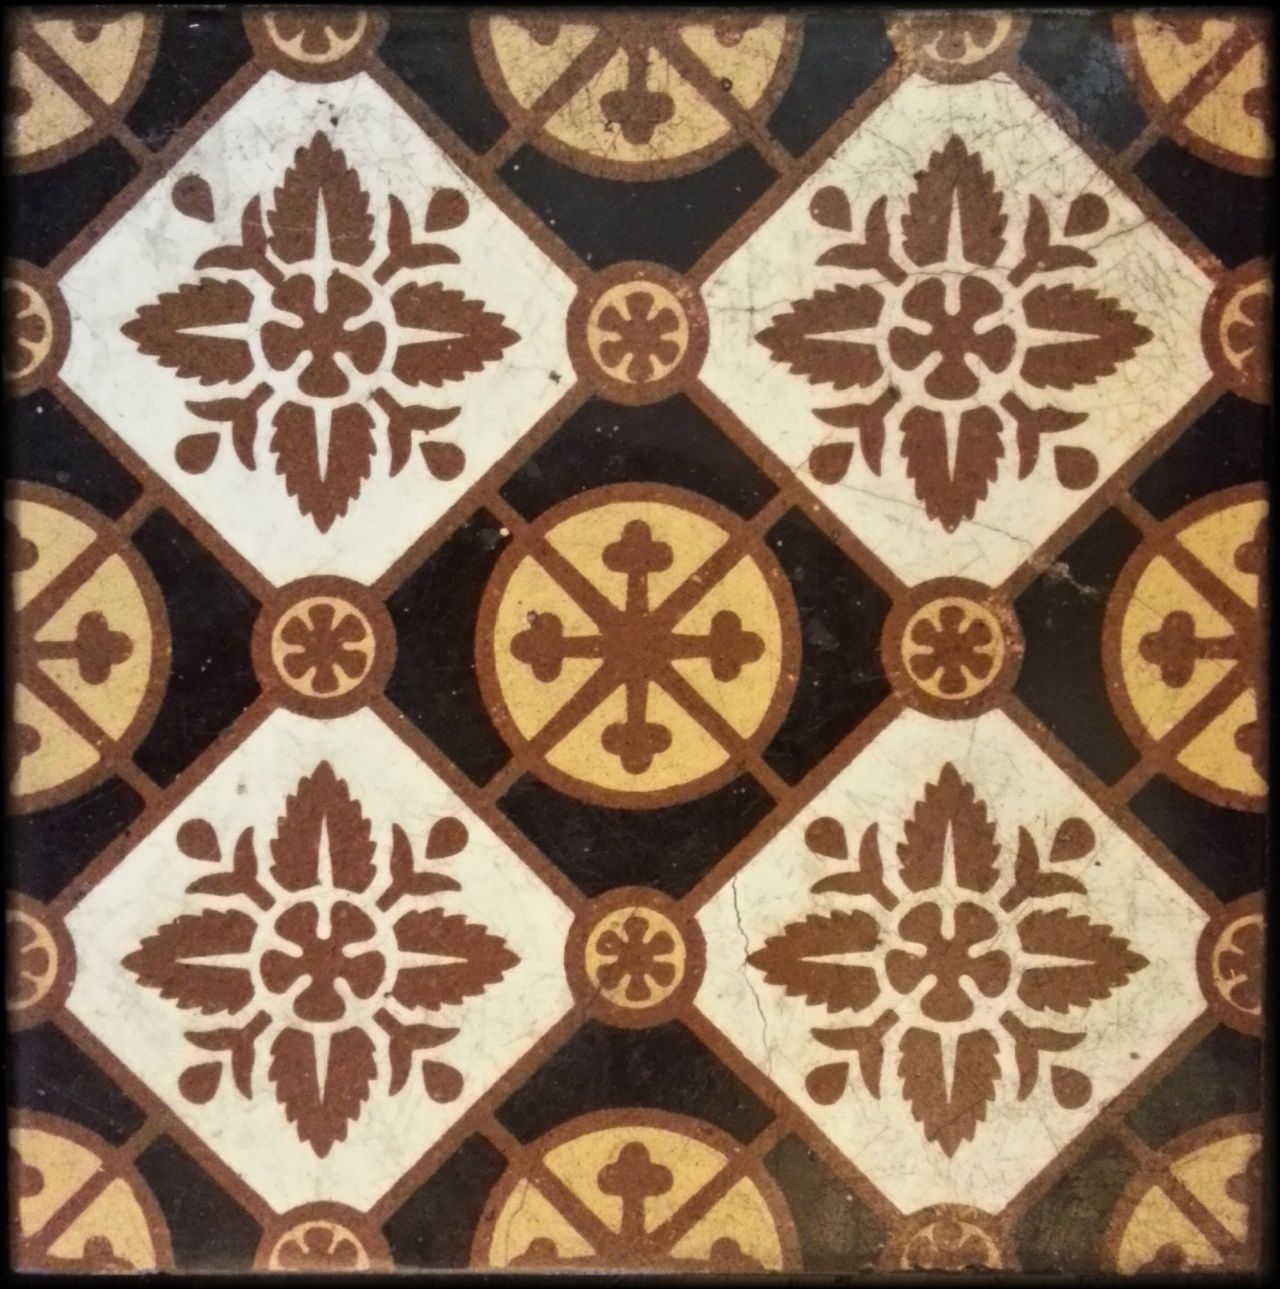 Gluing to ceramic tile image collections tile flooring design ideas vintage ceramic tile line a tray make wall art glue end to end vintage ceramic tile dailygadgetfo Images